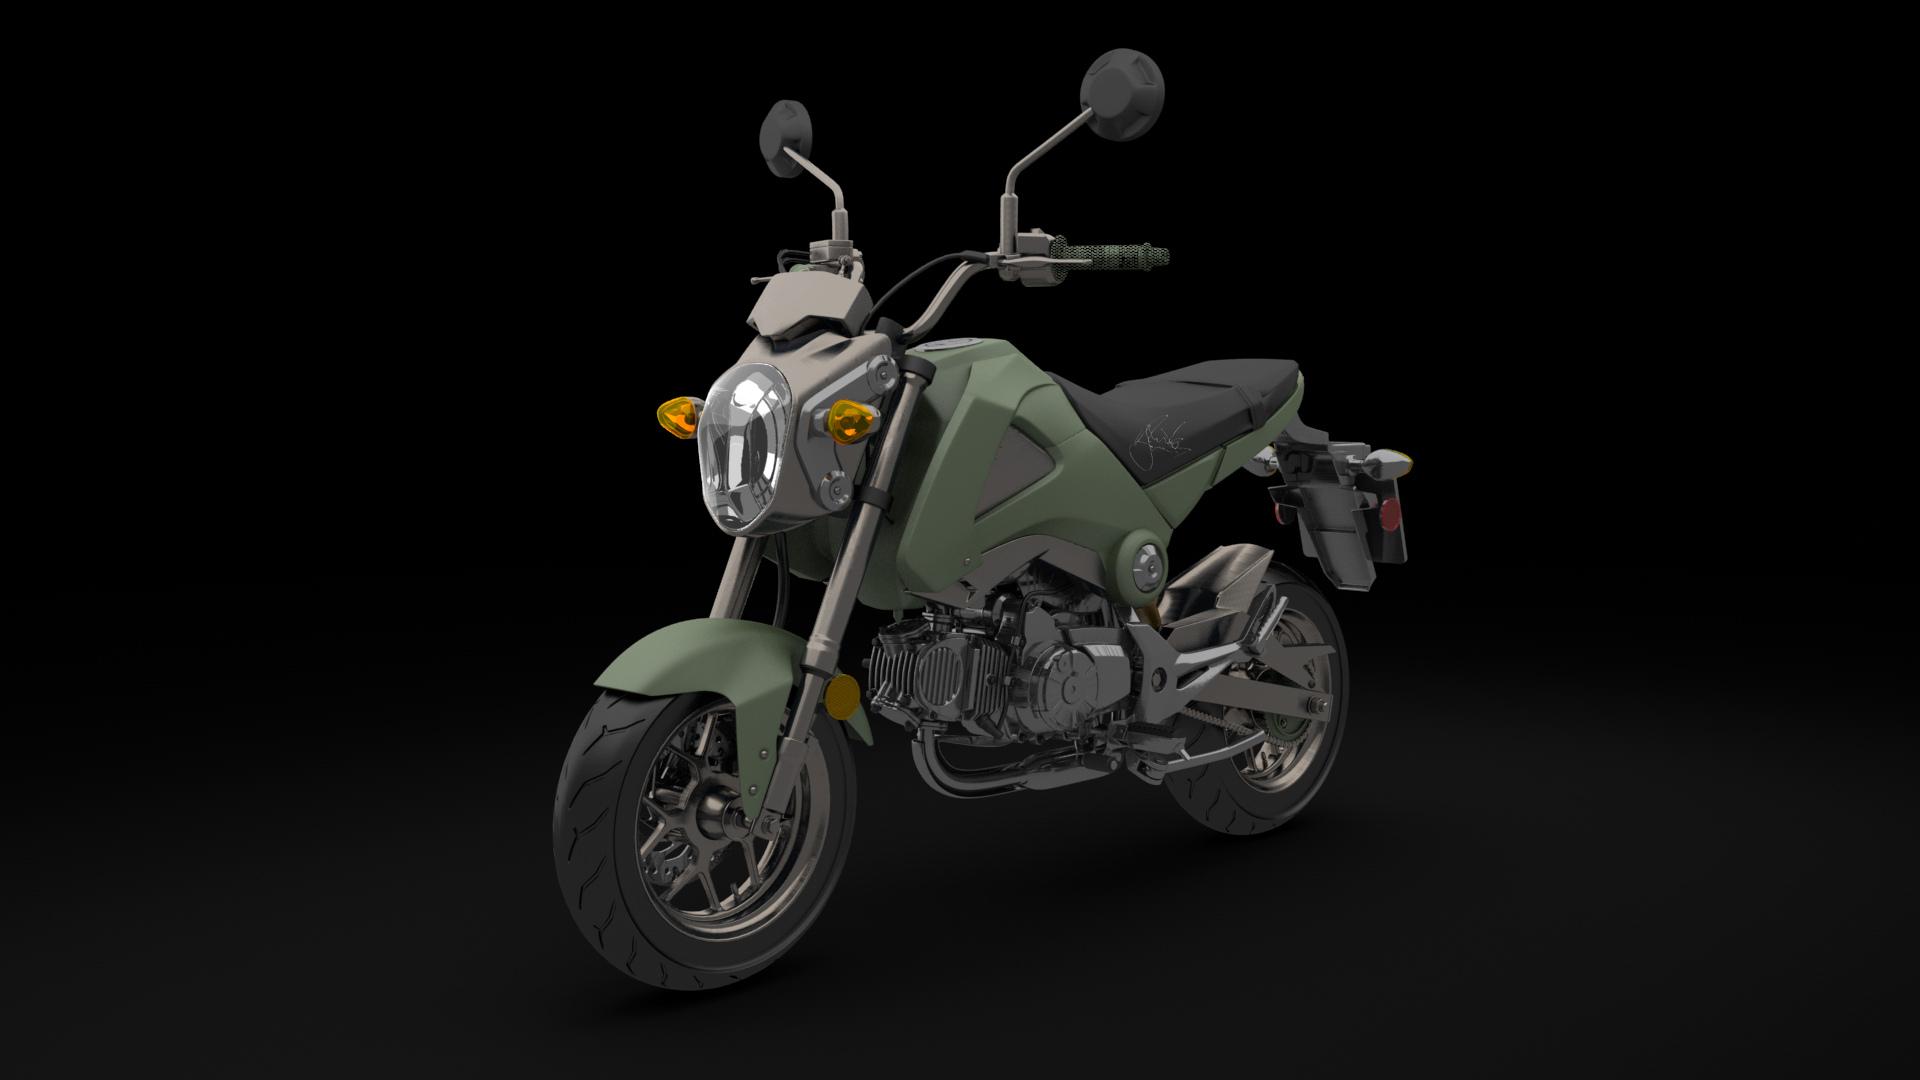 Honda Grom Motorcycle Customized And Autographed By Nick Jonas 169 Honda Motor Co Ltd Carrrs